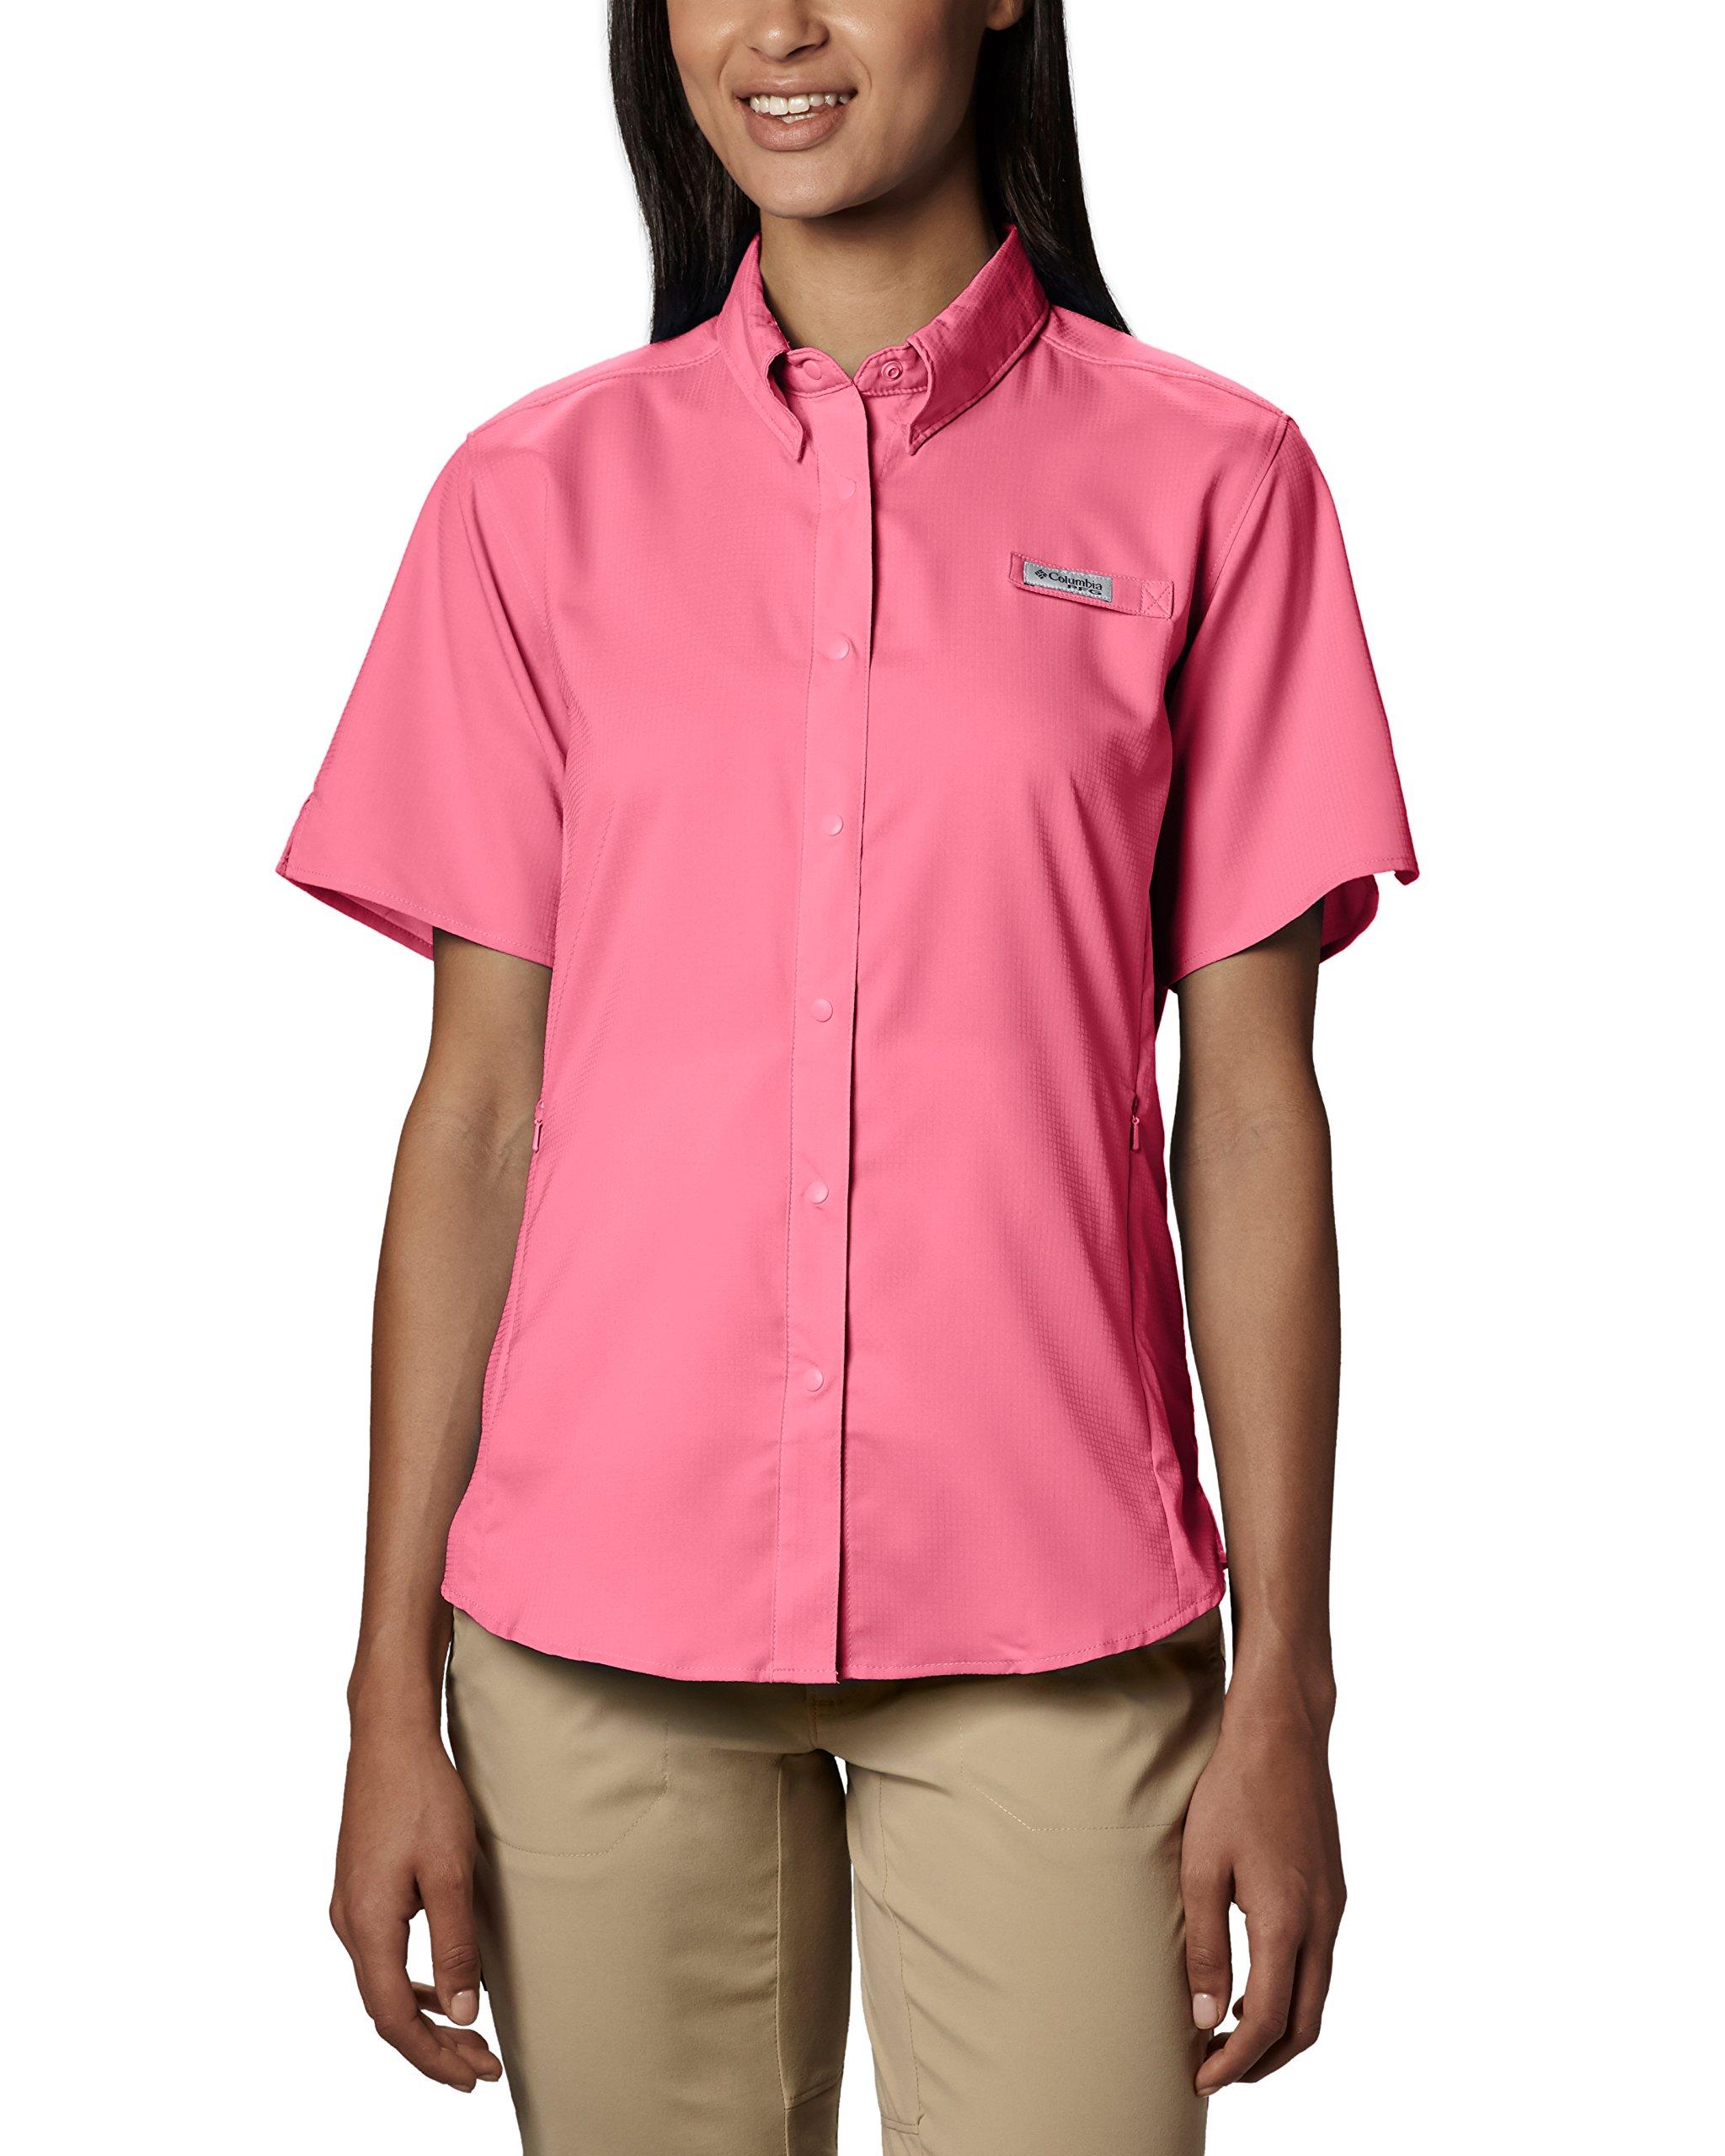 Columbia Women's Tamiami Ii Short Sleeve Shirt, Lollipop, Large